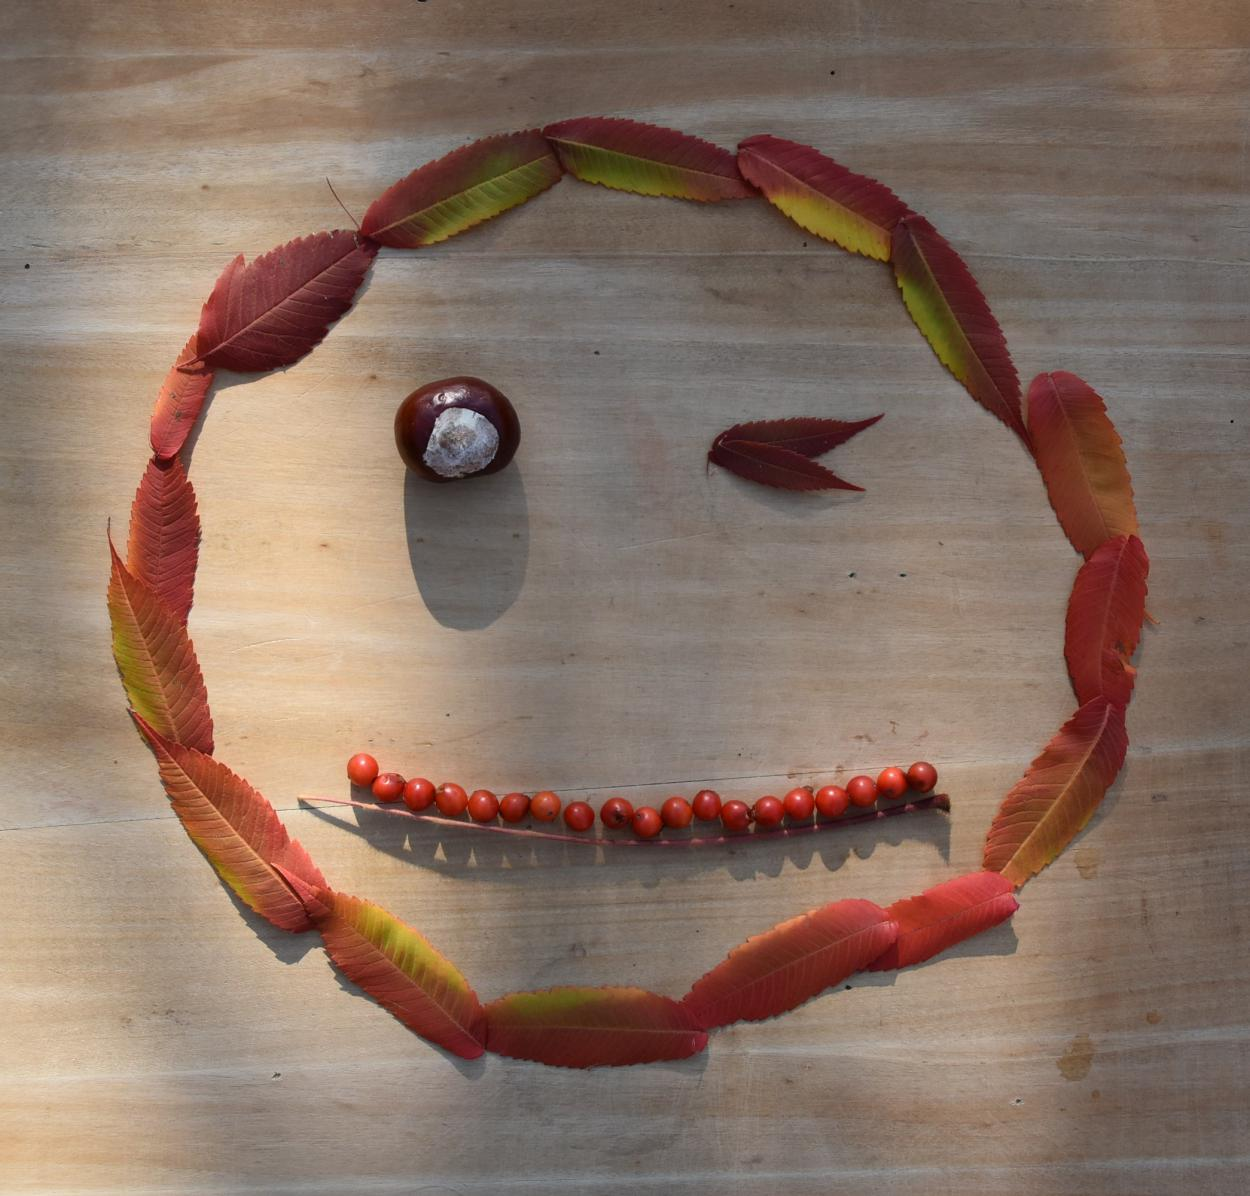 Smiley, Herbstdekoration, DIY, Blinzelauge